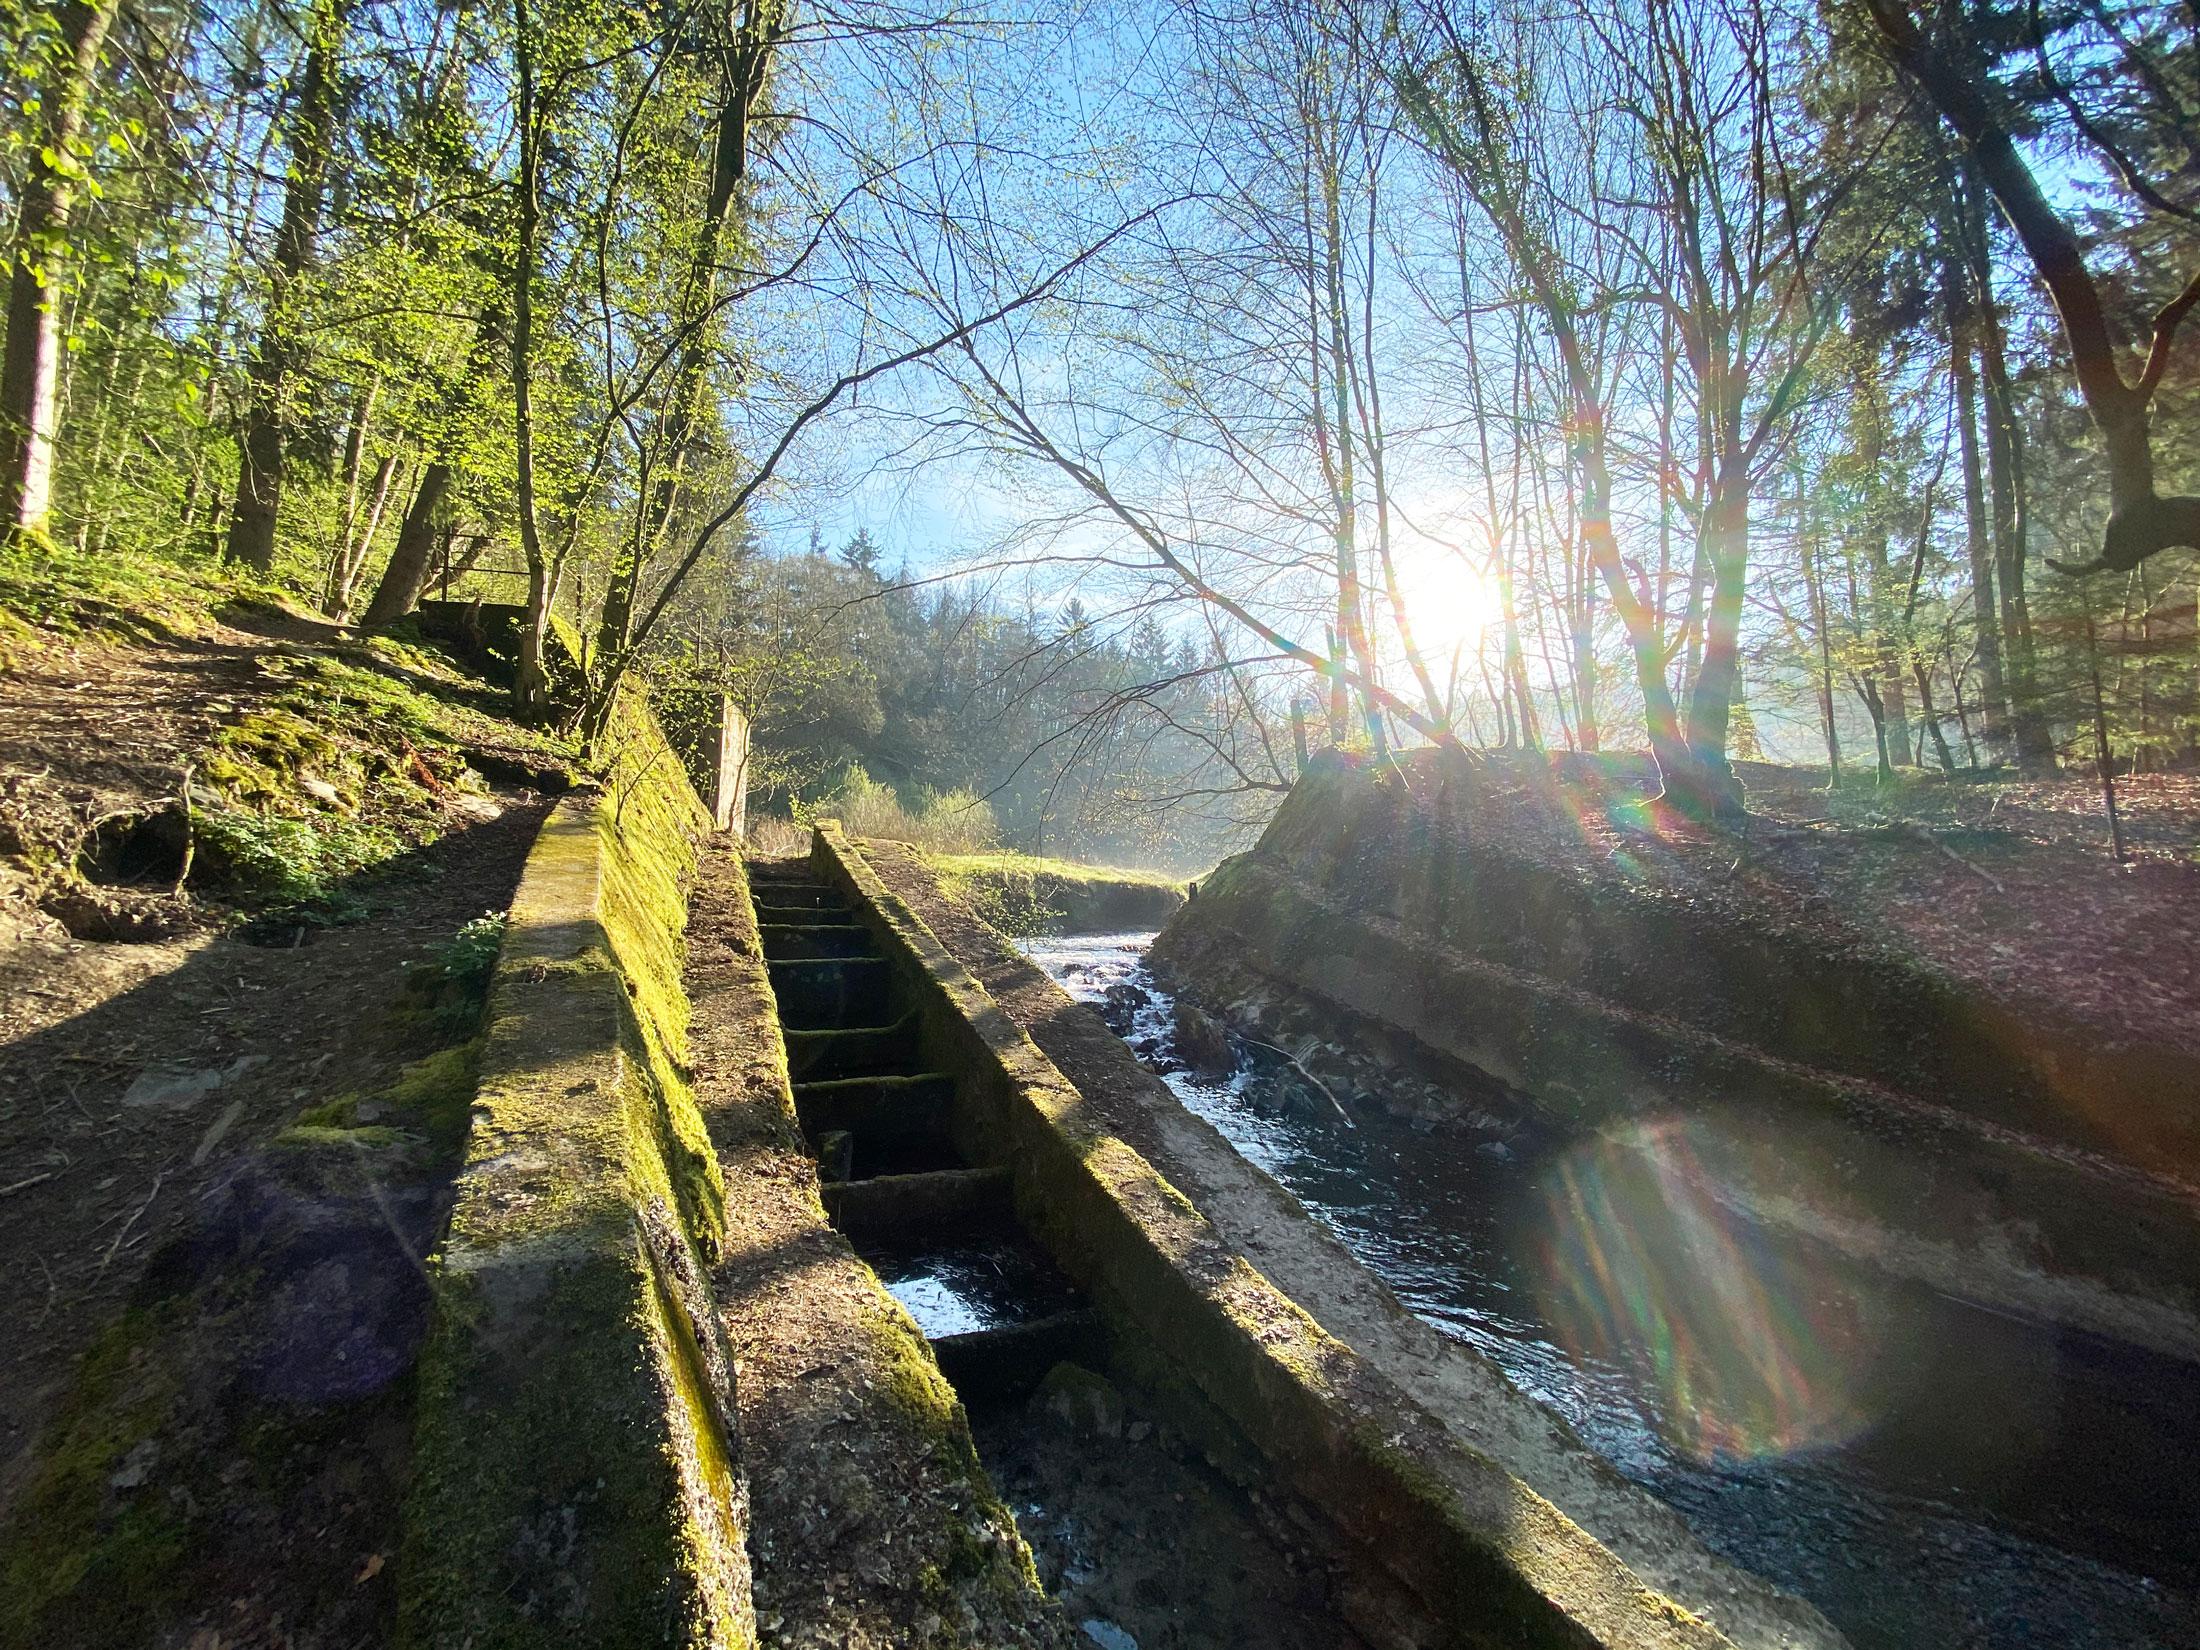 Burscheid Eifgenbachtal Wanderung - Walk & Wonder